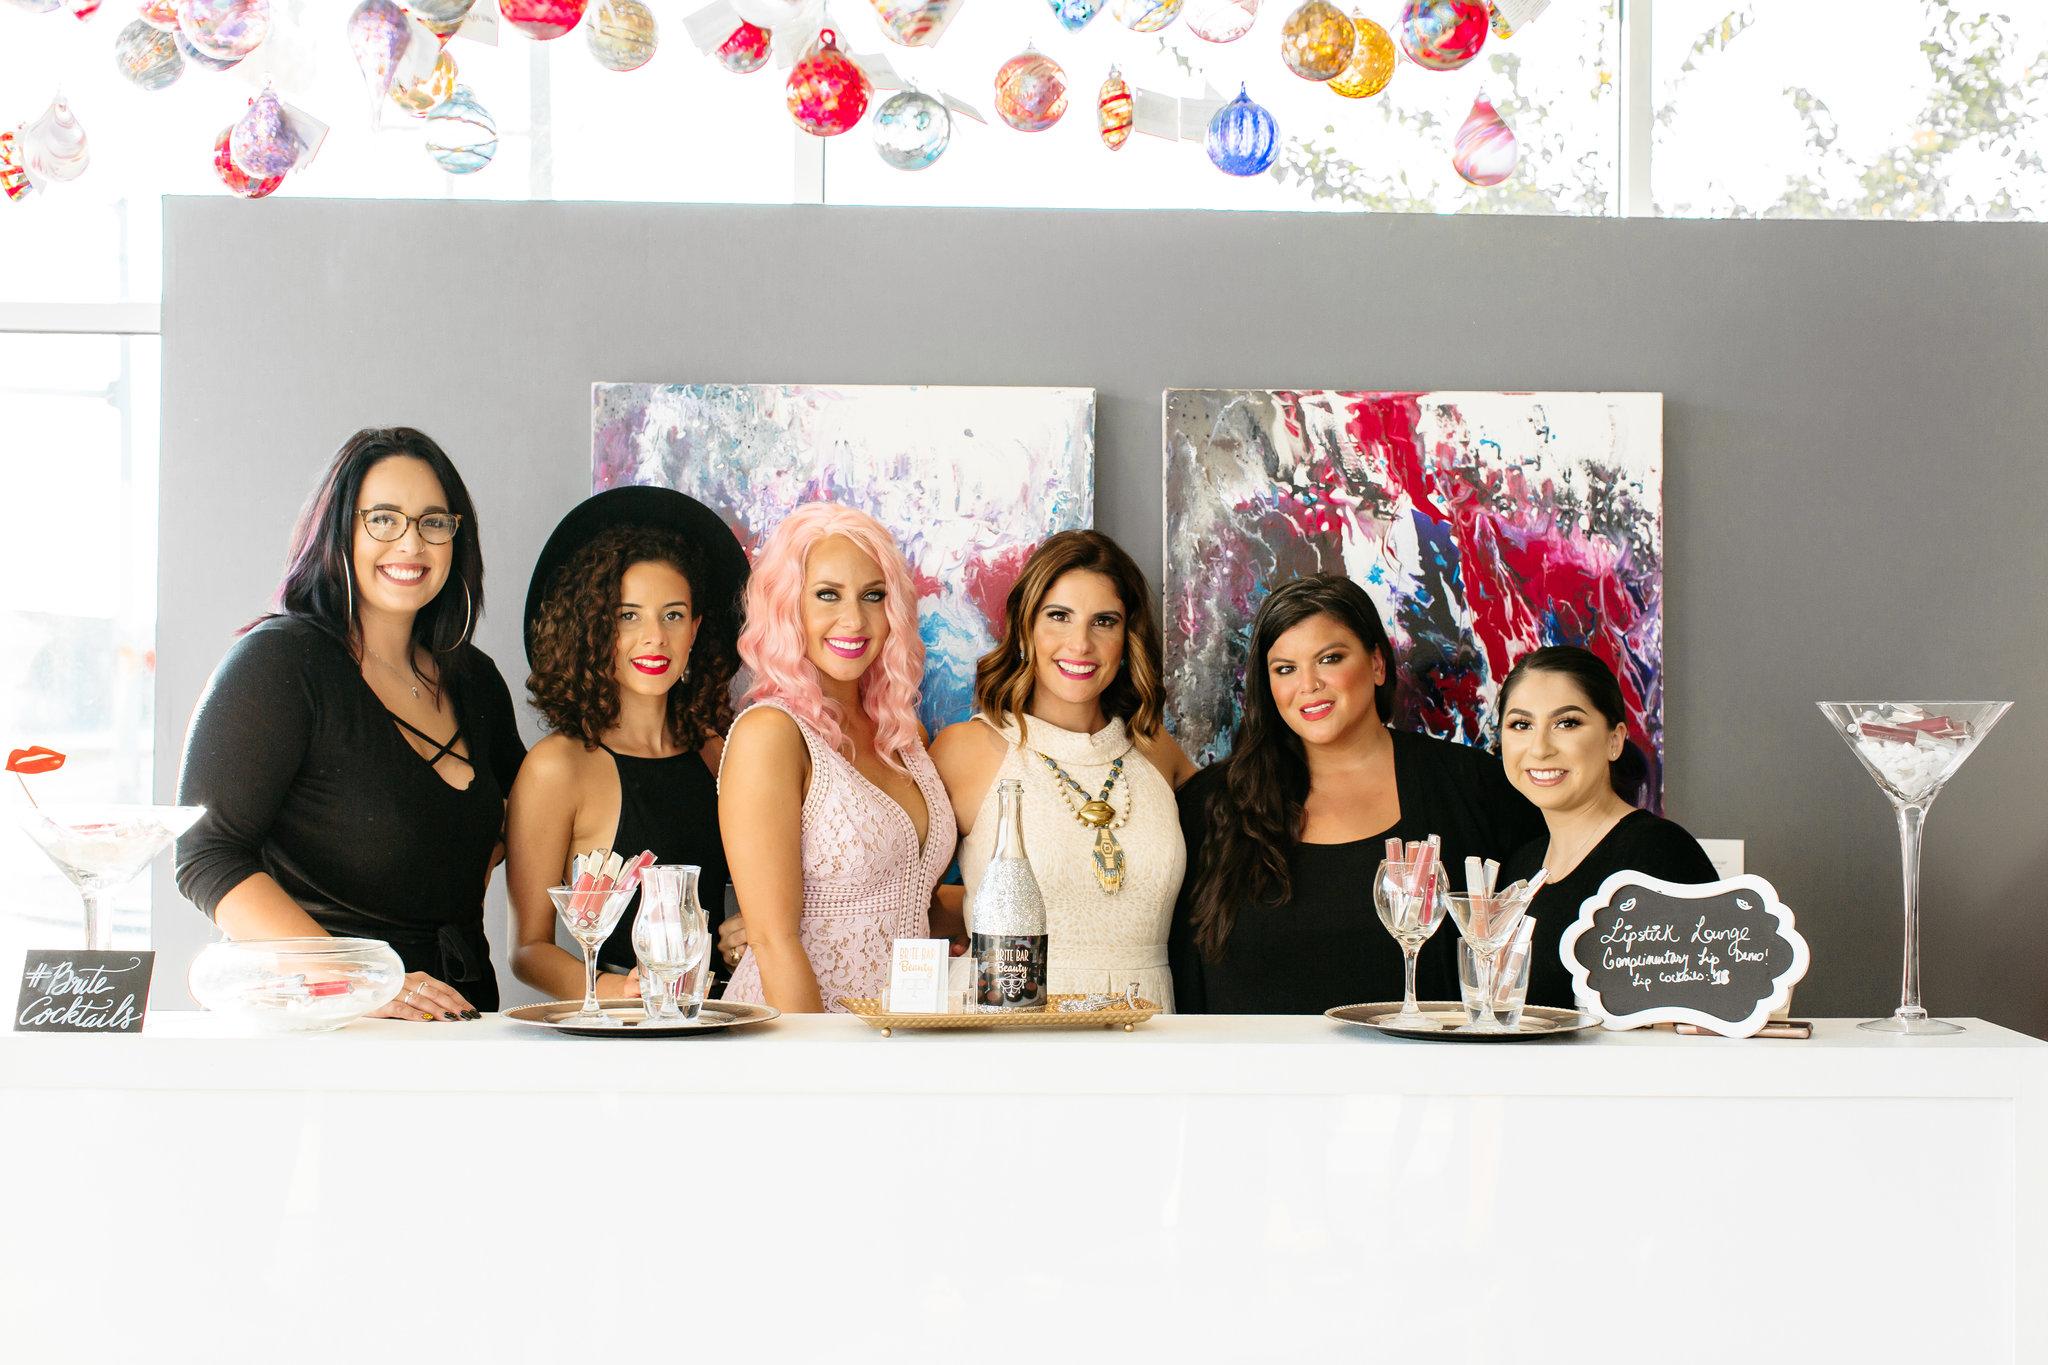 Alexa-Vossler-Photo_Dallas-Event-Photographer_Brite-Bar-Beauty-2018-Lipstick-Launch-Party-17.jpg